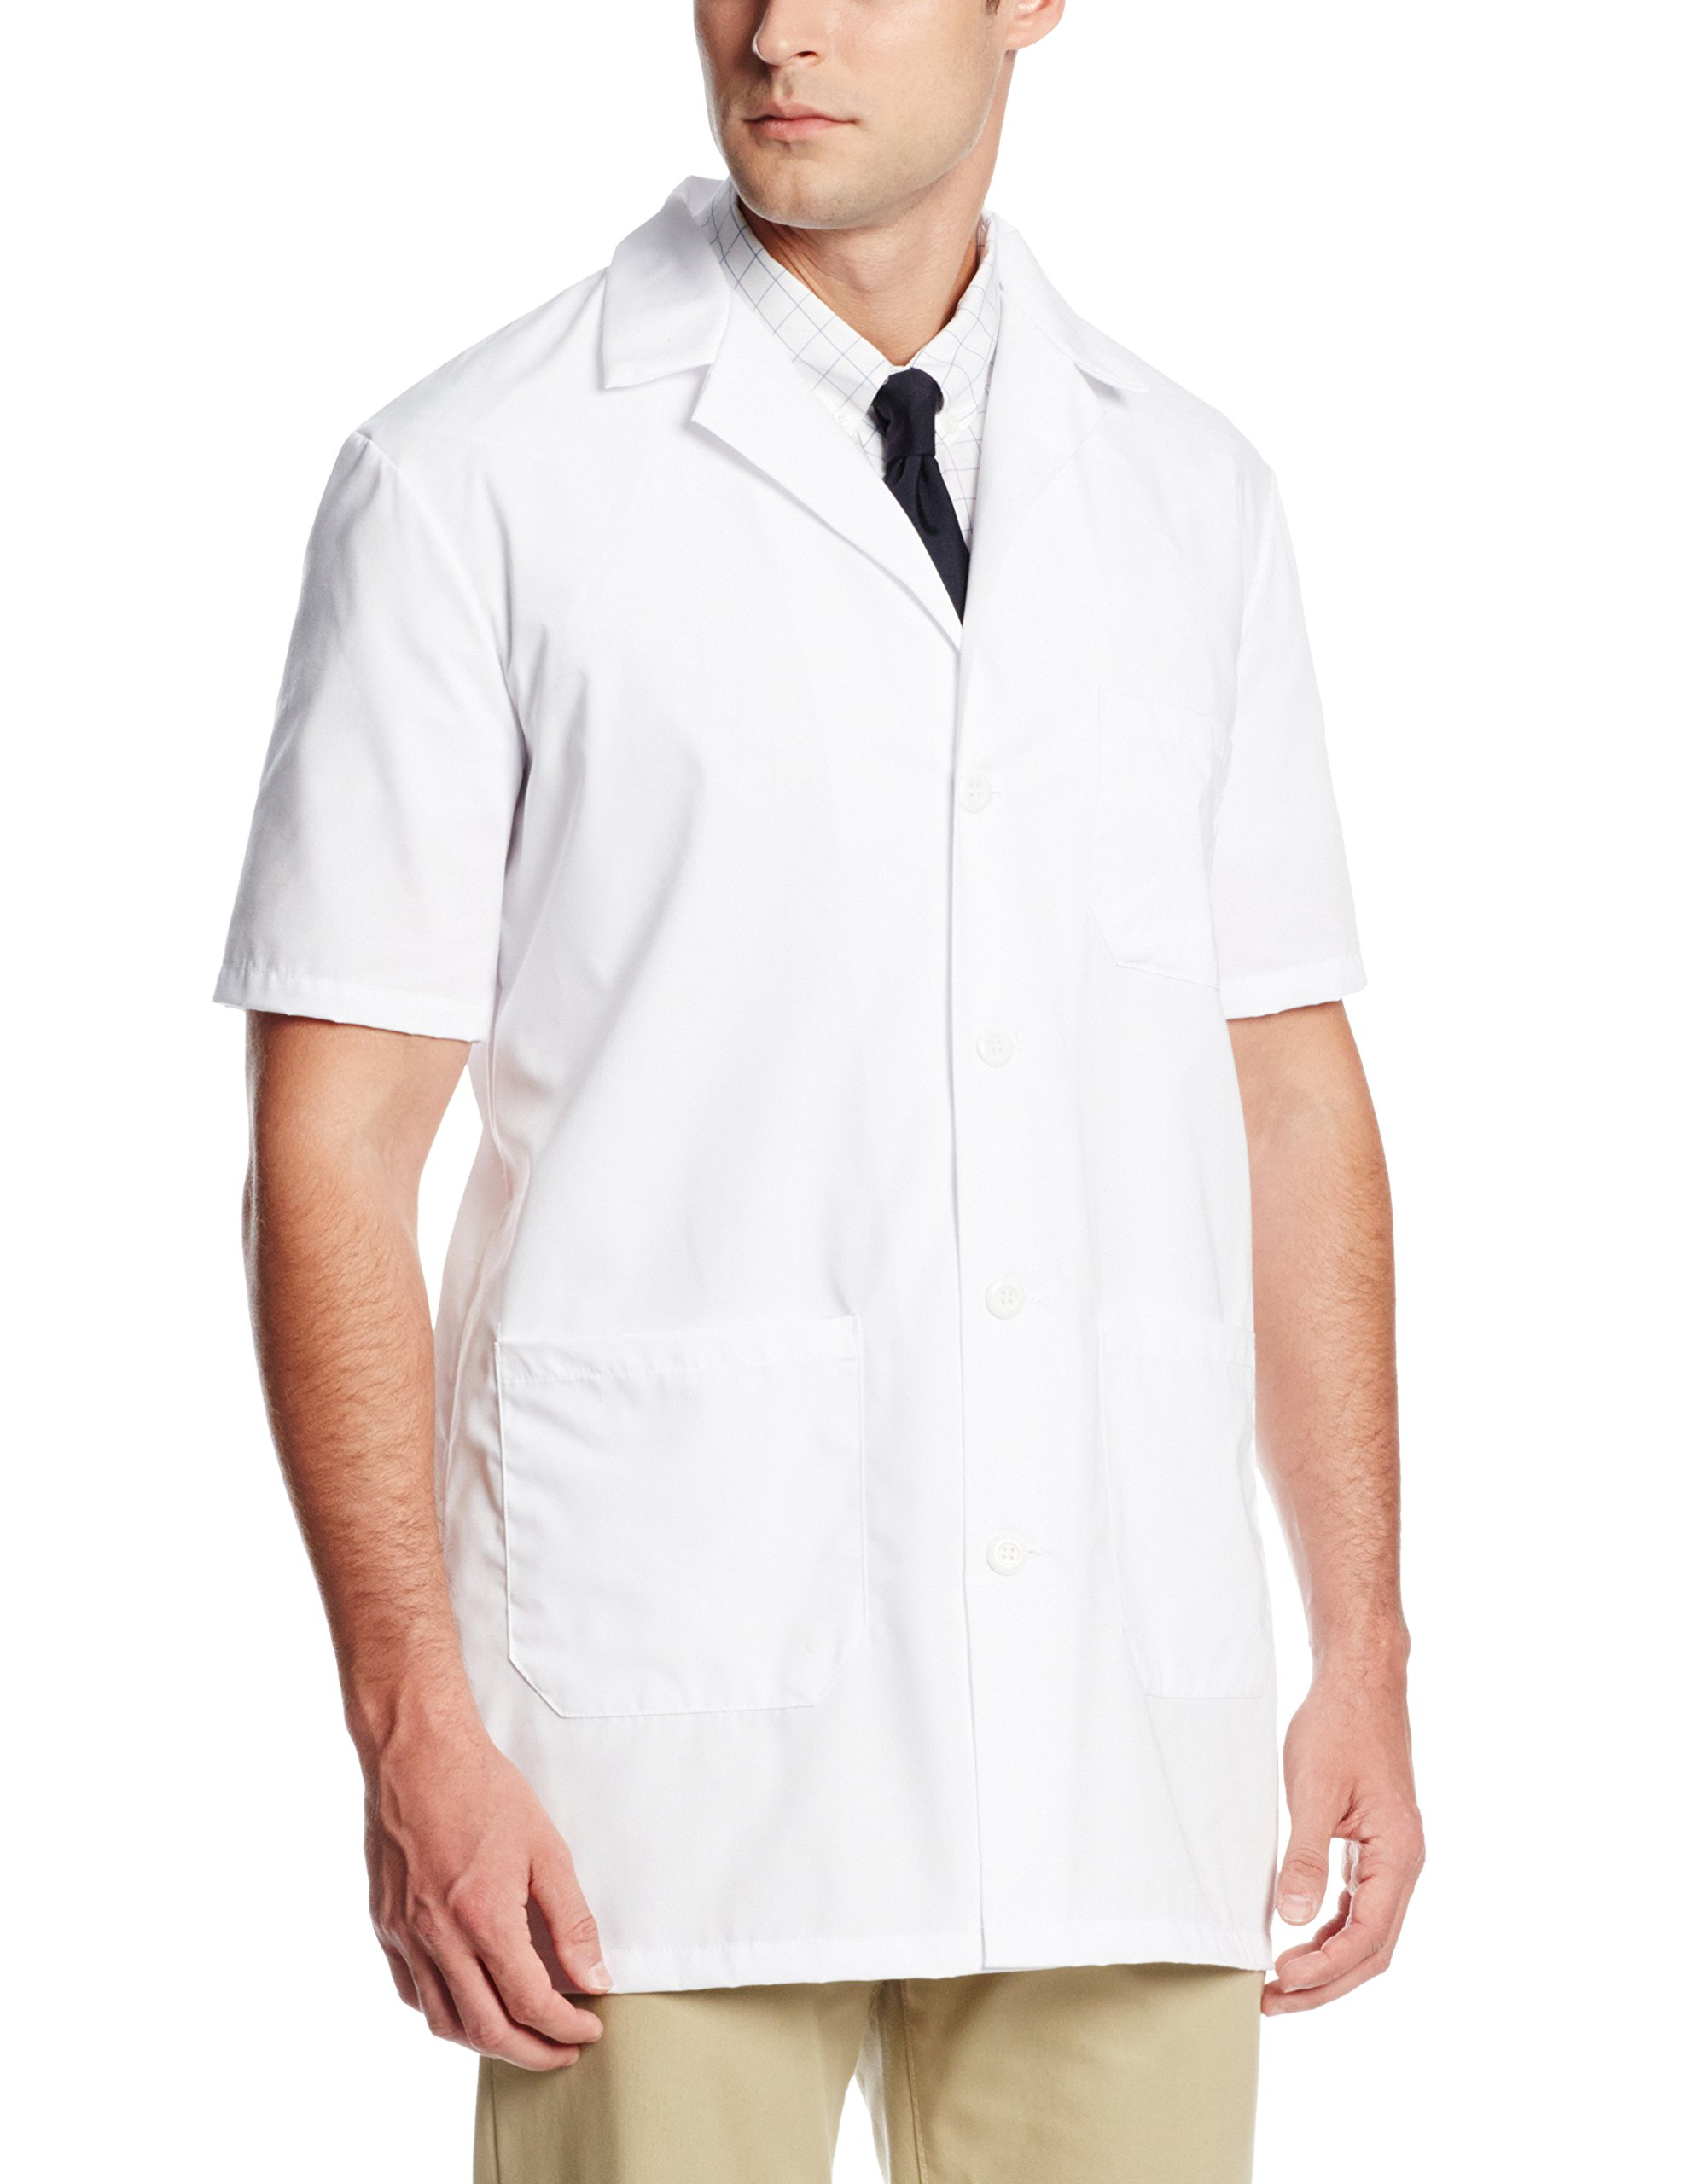 Worklon 3409 Polyester/Cotton Unisex Short Sleeve Pharmacy Lab Coat with Button Closure, Medium, White